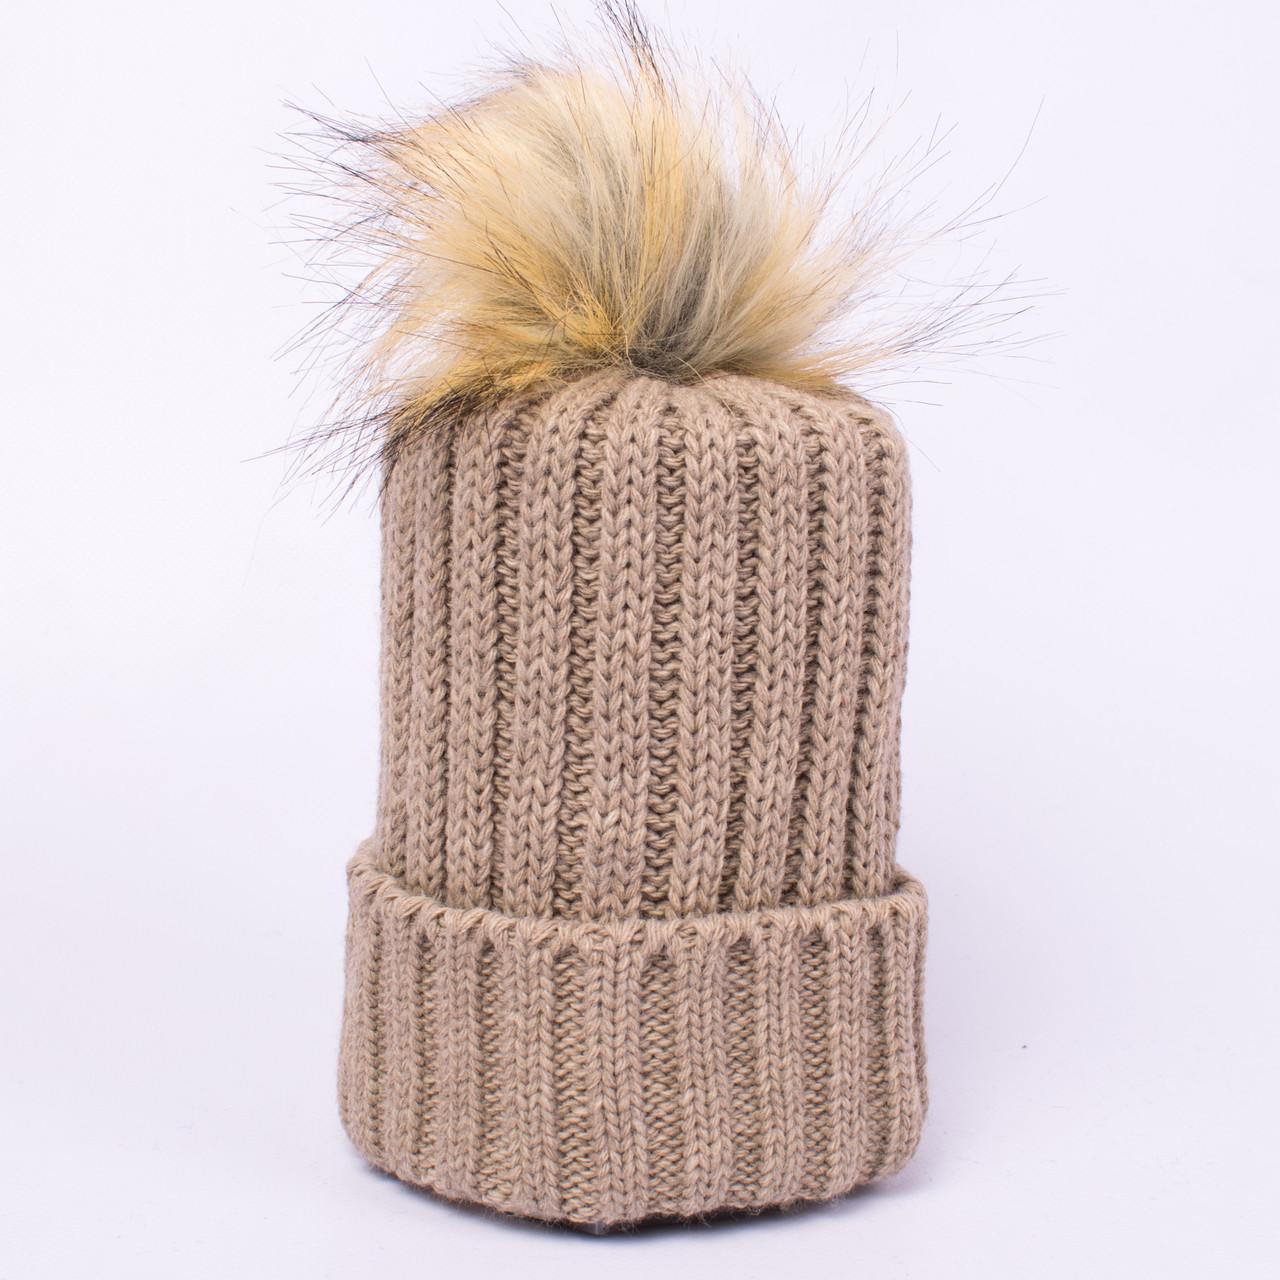 Женская вязаная шапка с помпоном темно-бежевая CMF W18-12 03 Canberra